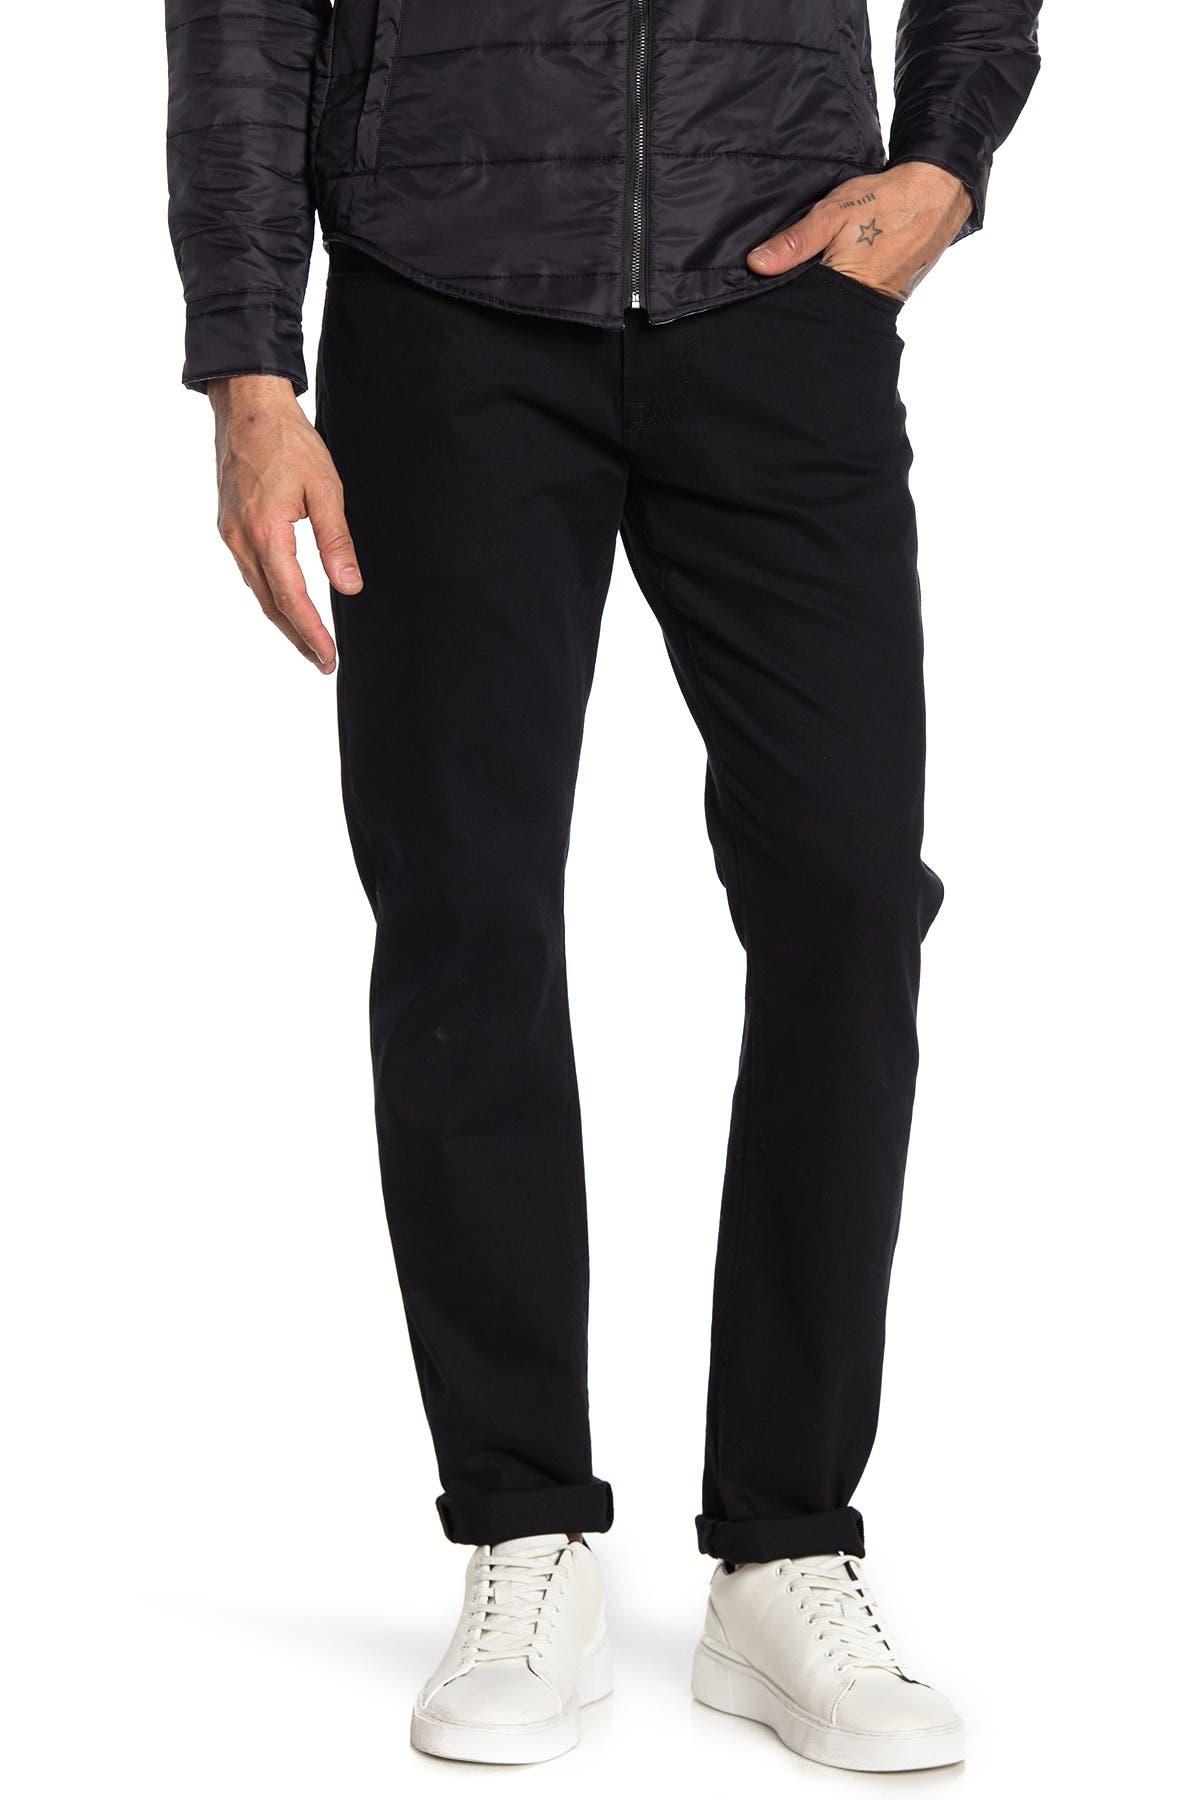 "Image of Mavi Marcus Soho Straight Jeans - 32"" Inseam"